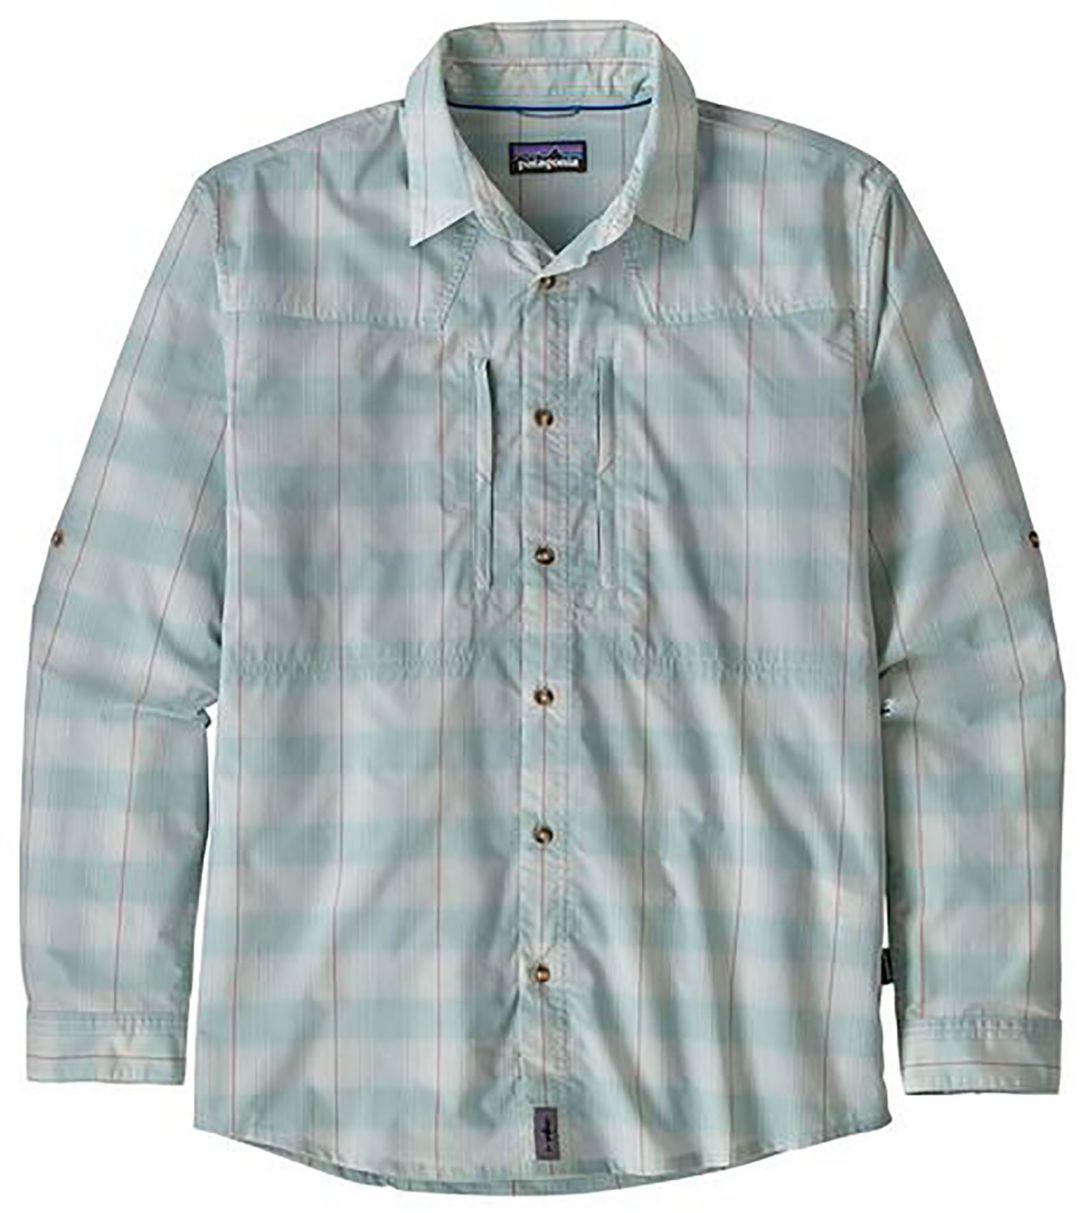 8b4a69eff Patagonia Men s Sun Stretch Long Sleeve Button Down Shirt 1